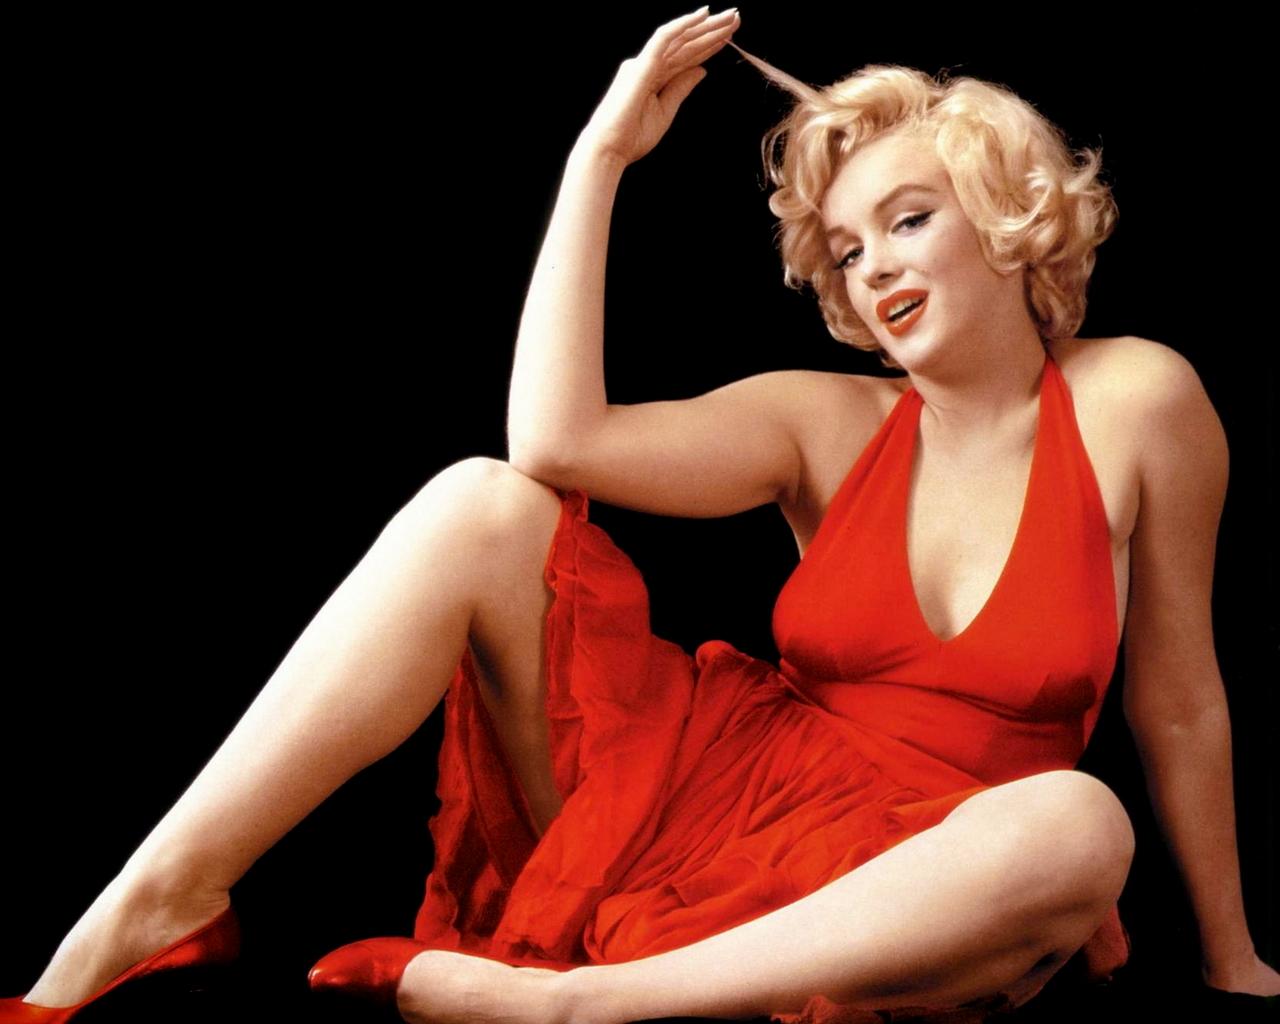 The-Hot-Looking-Marilyn-Monroe